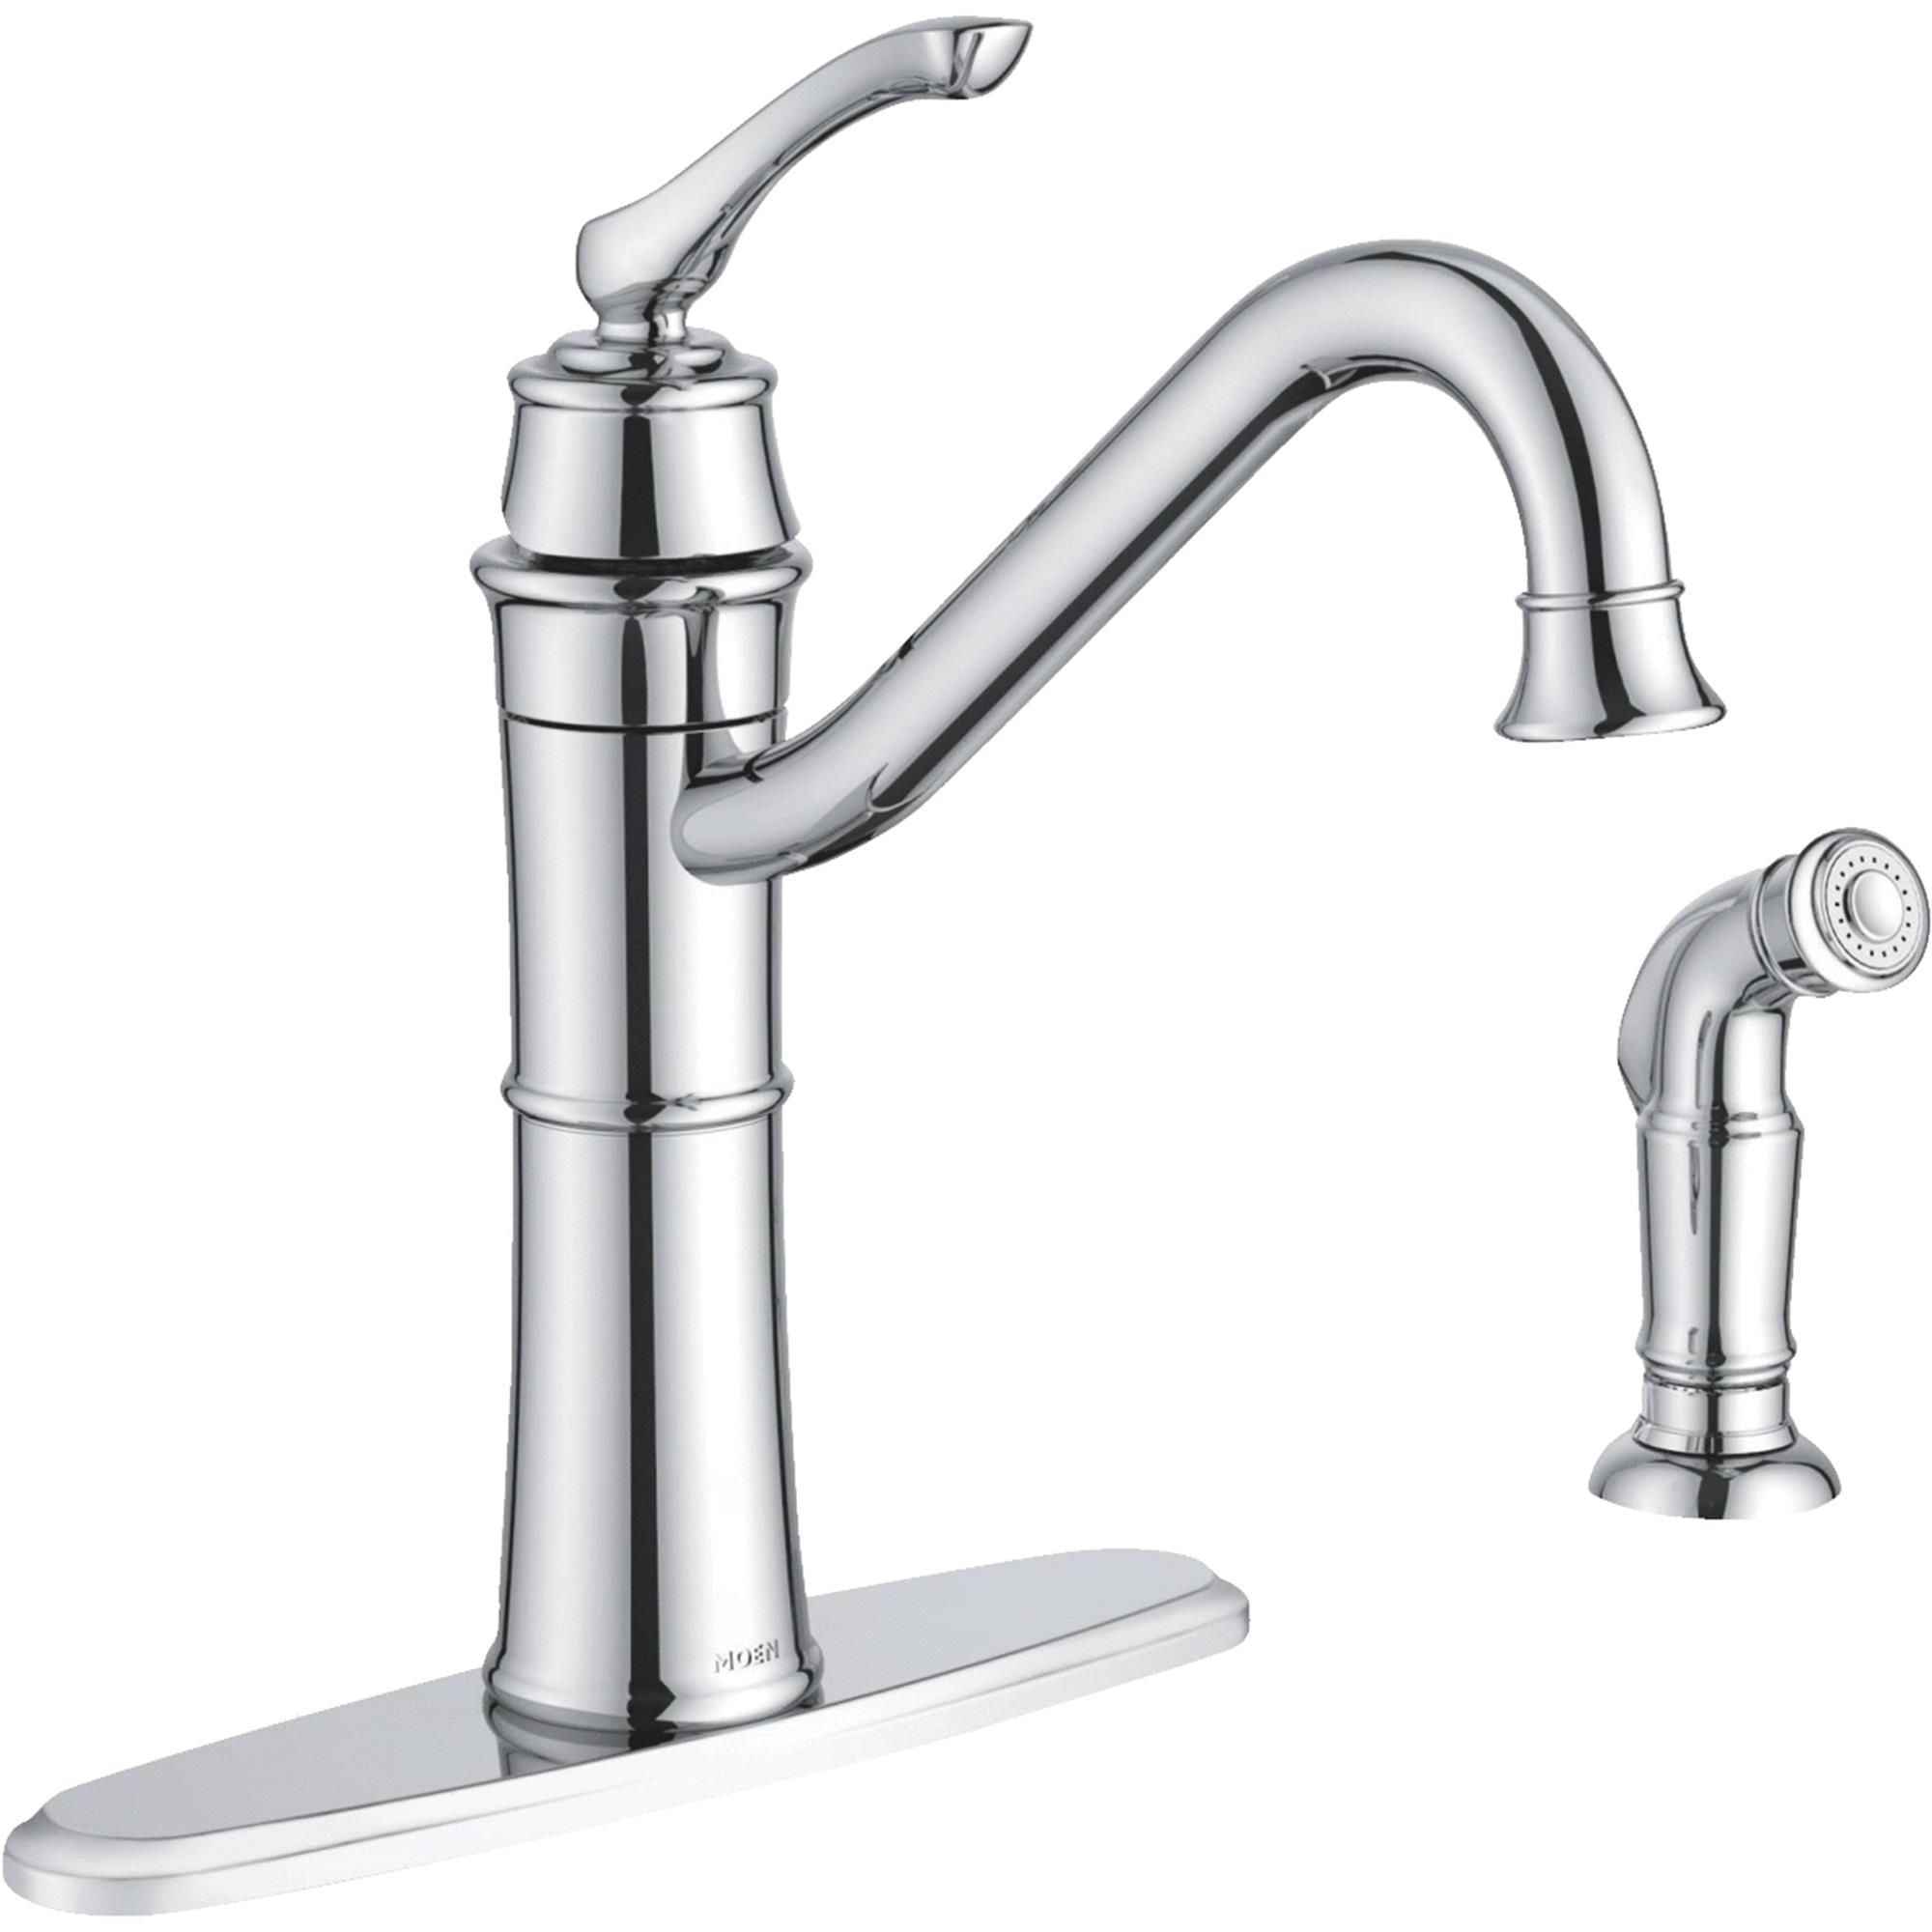 Moen Wetherly Single Handle Kitchen Faucet With Side Sprayer Walmart Com Walmart Com